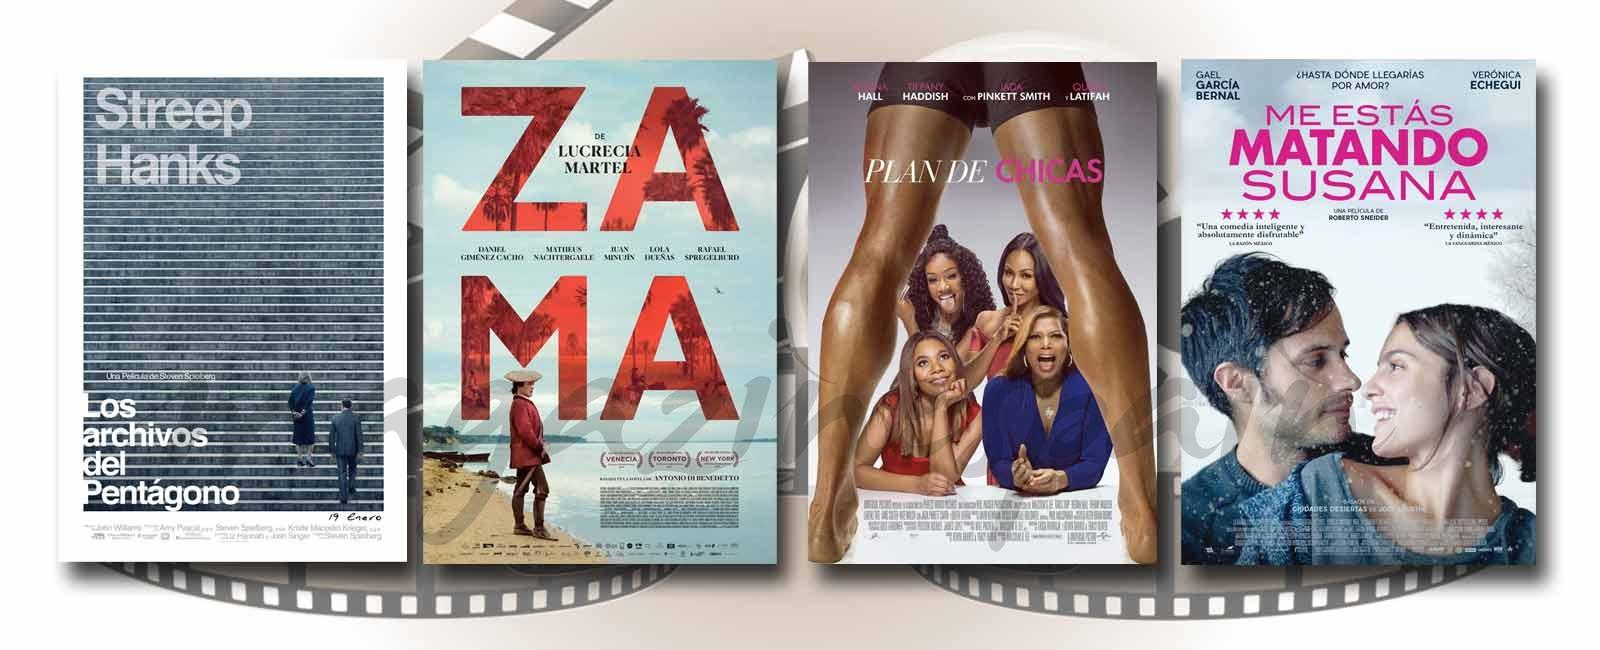 cine 19 enero